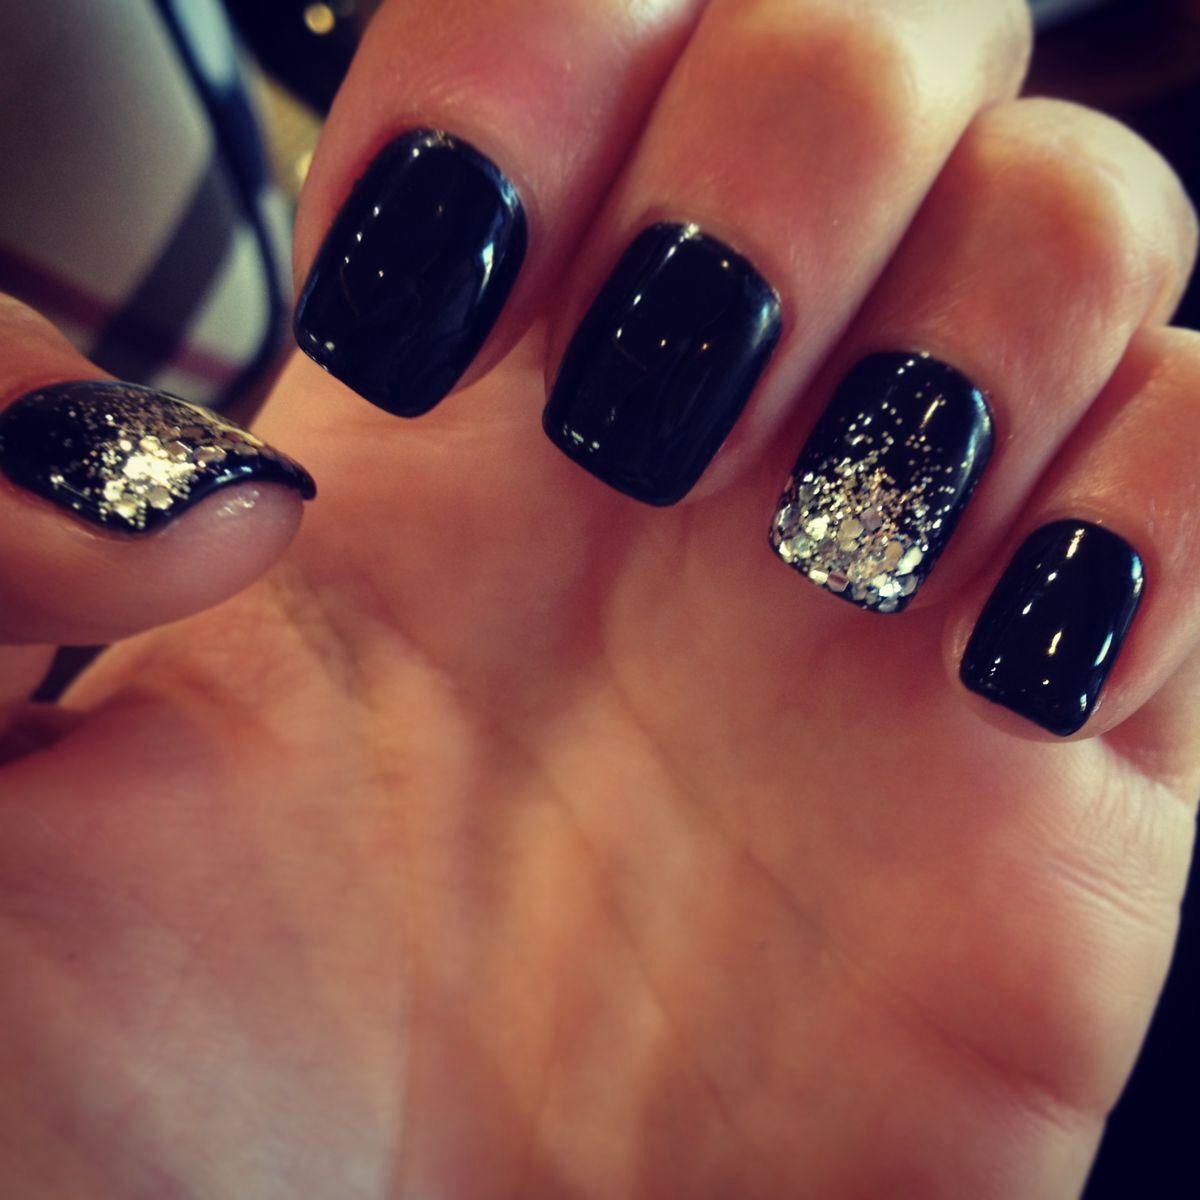 Black Nails Silver Glitter Tip Accent Nails Cute Nails Prom Nails Black Nail Designs